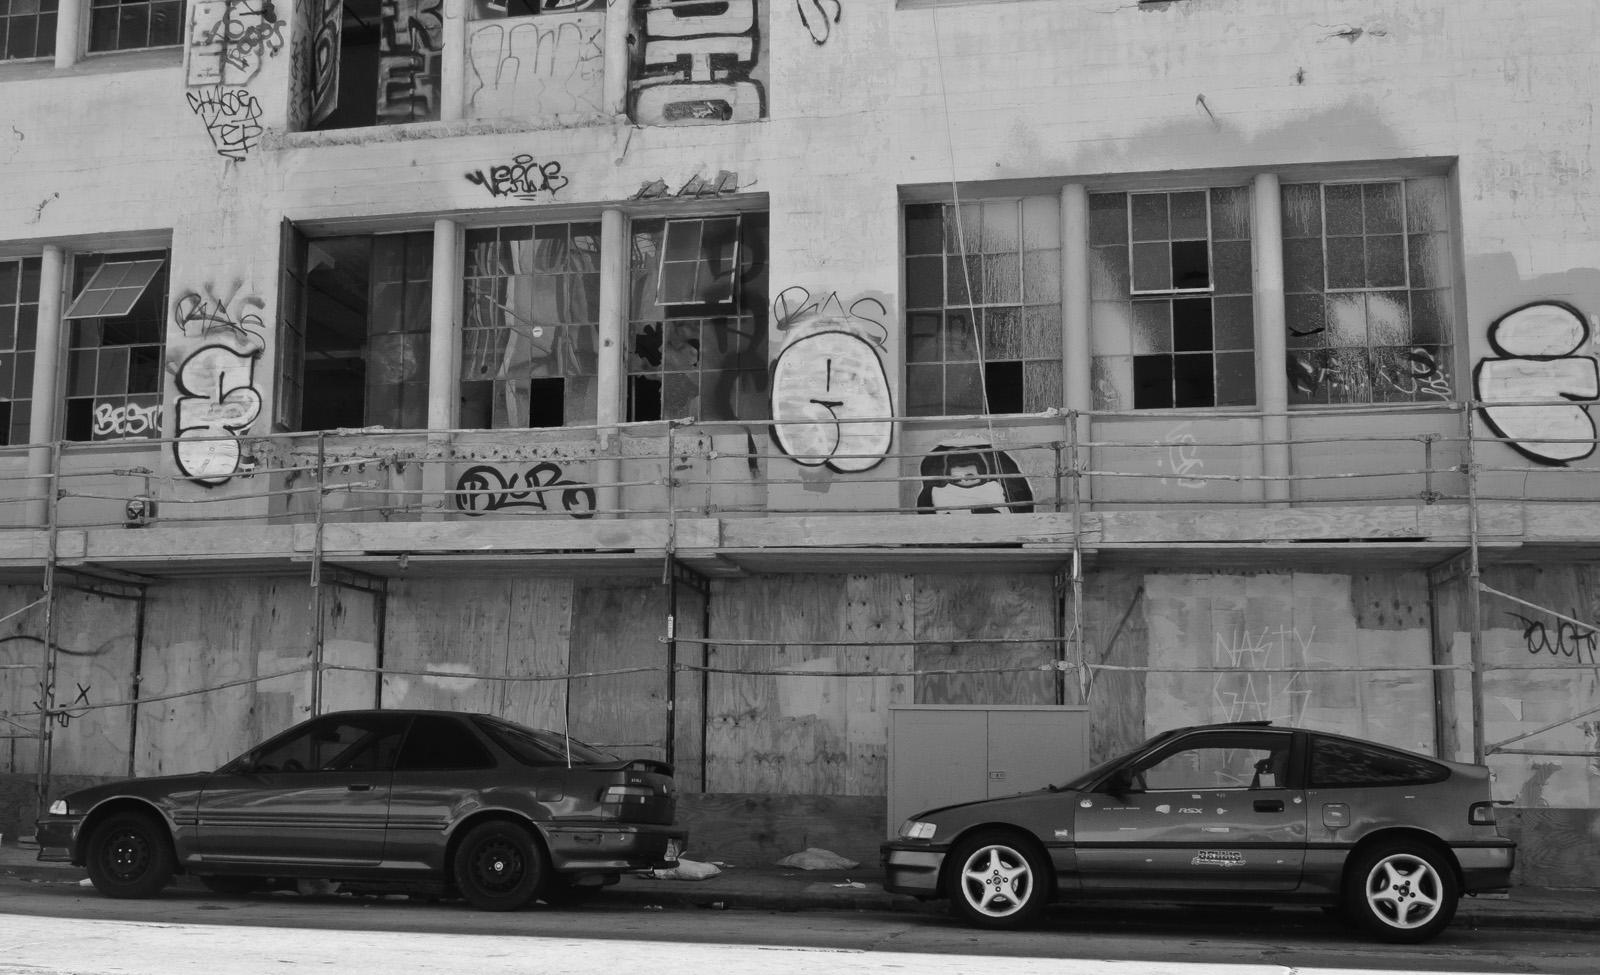 Honda Los Angeles >> File:Abandoned building, La Brea & Romaine, Los Angeles (7960324666).jpg - Wikimedia Commons